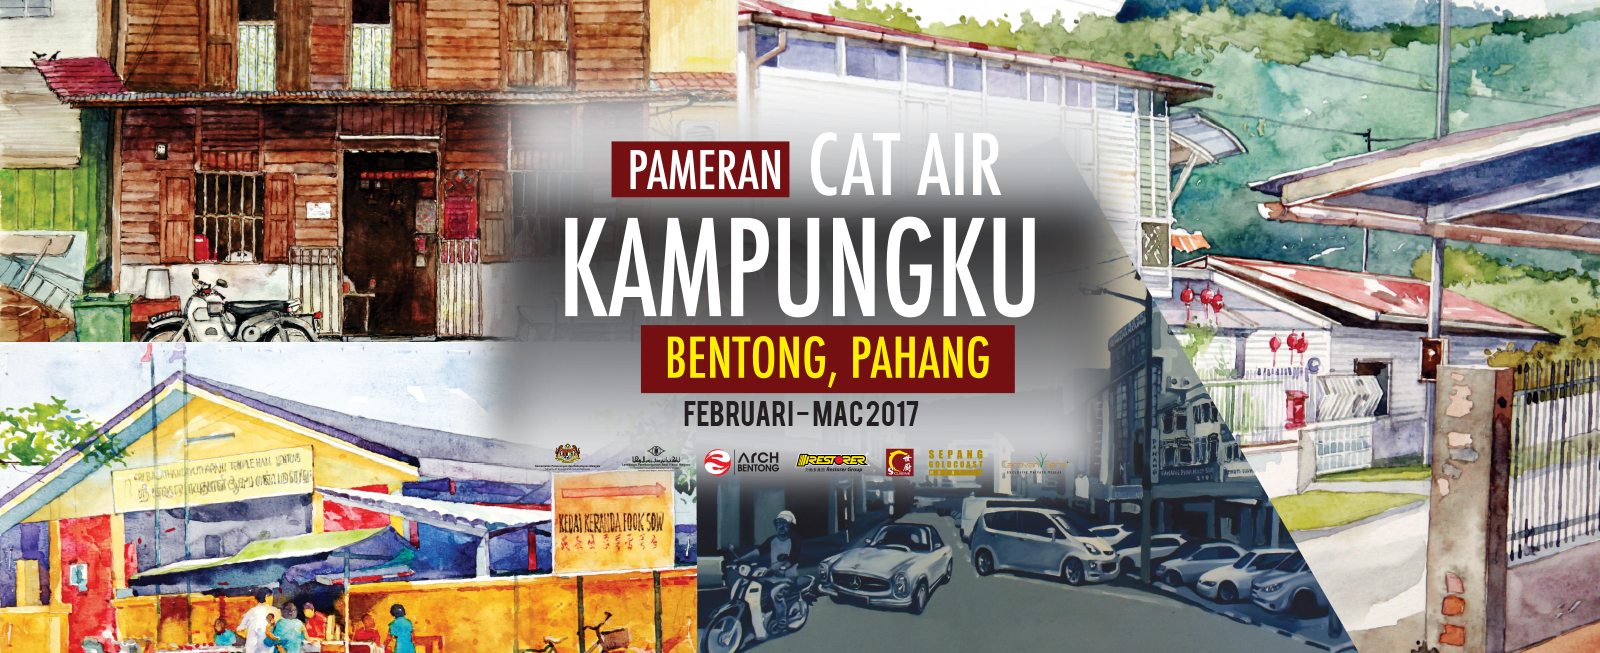 Paeran Cat Air Bentong portal BSVN